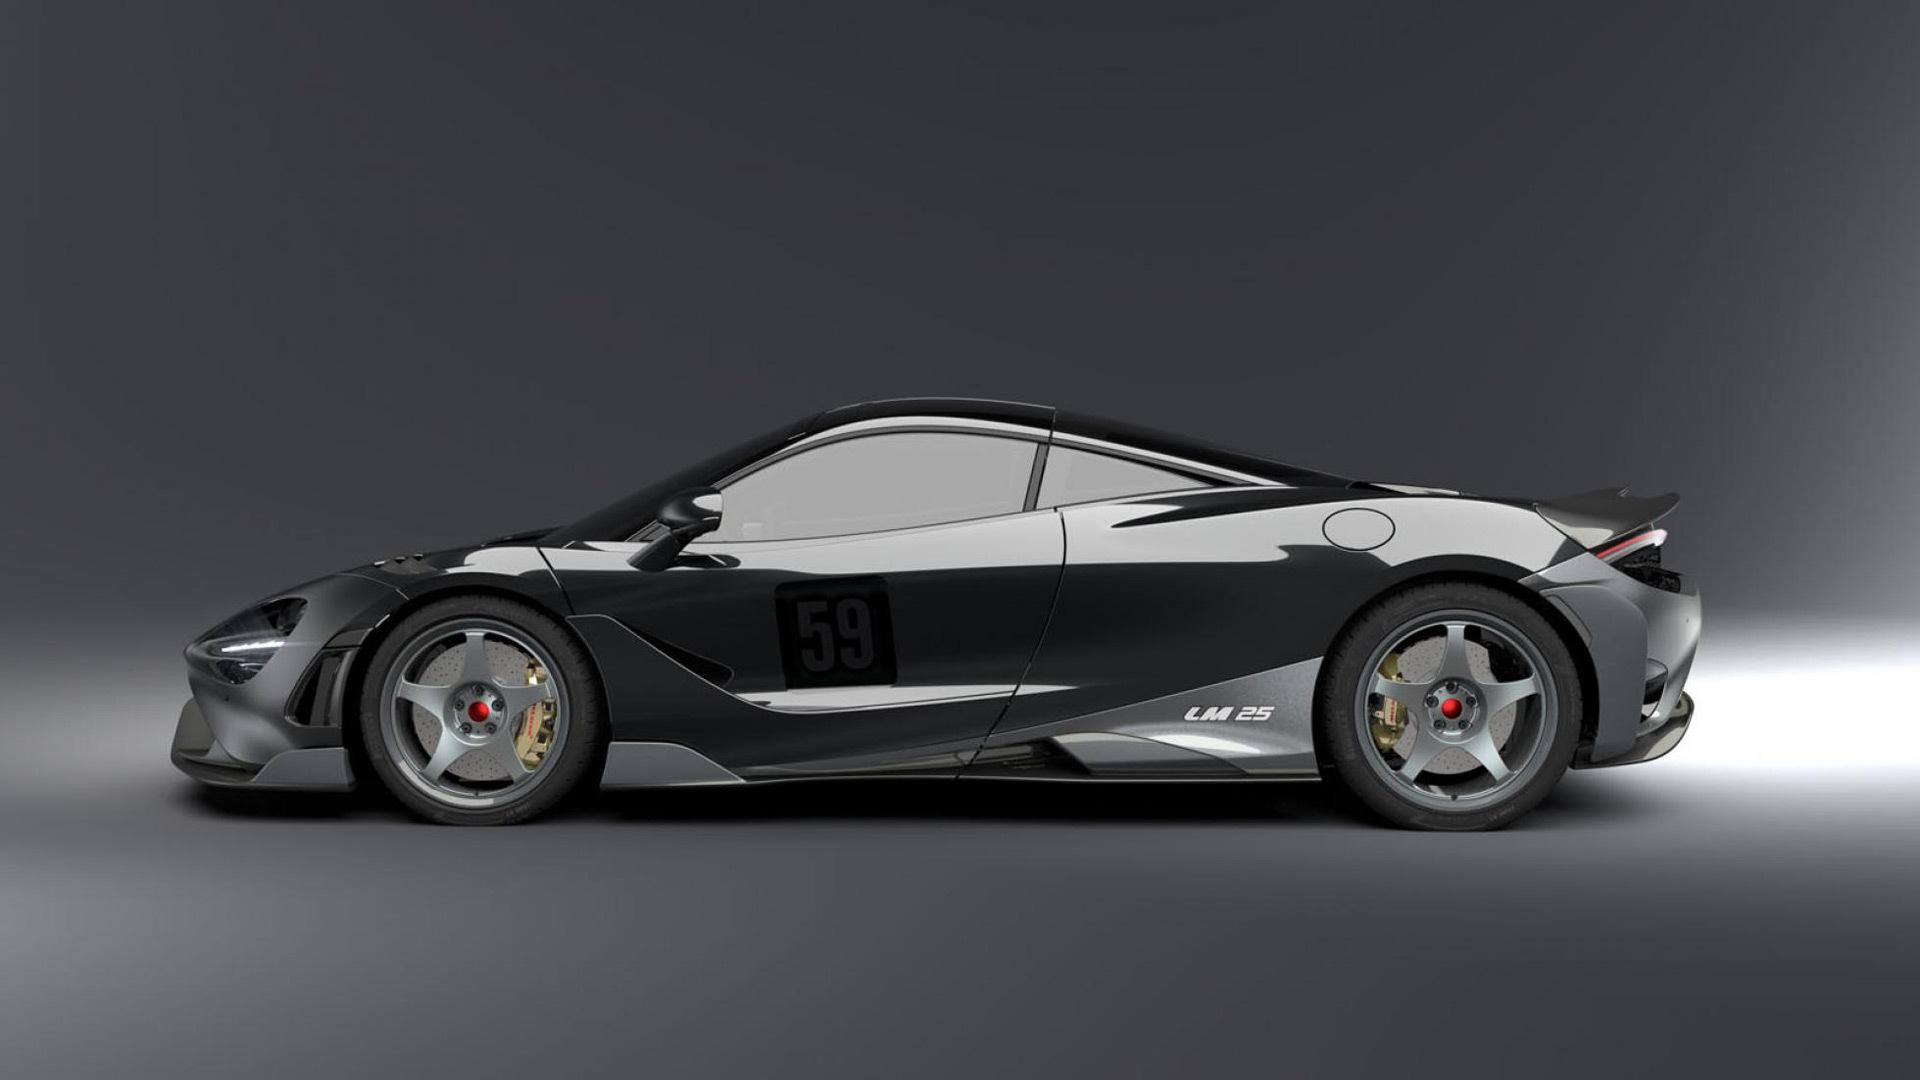 McLaren 765LT LM 25 Edition by Lanzante